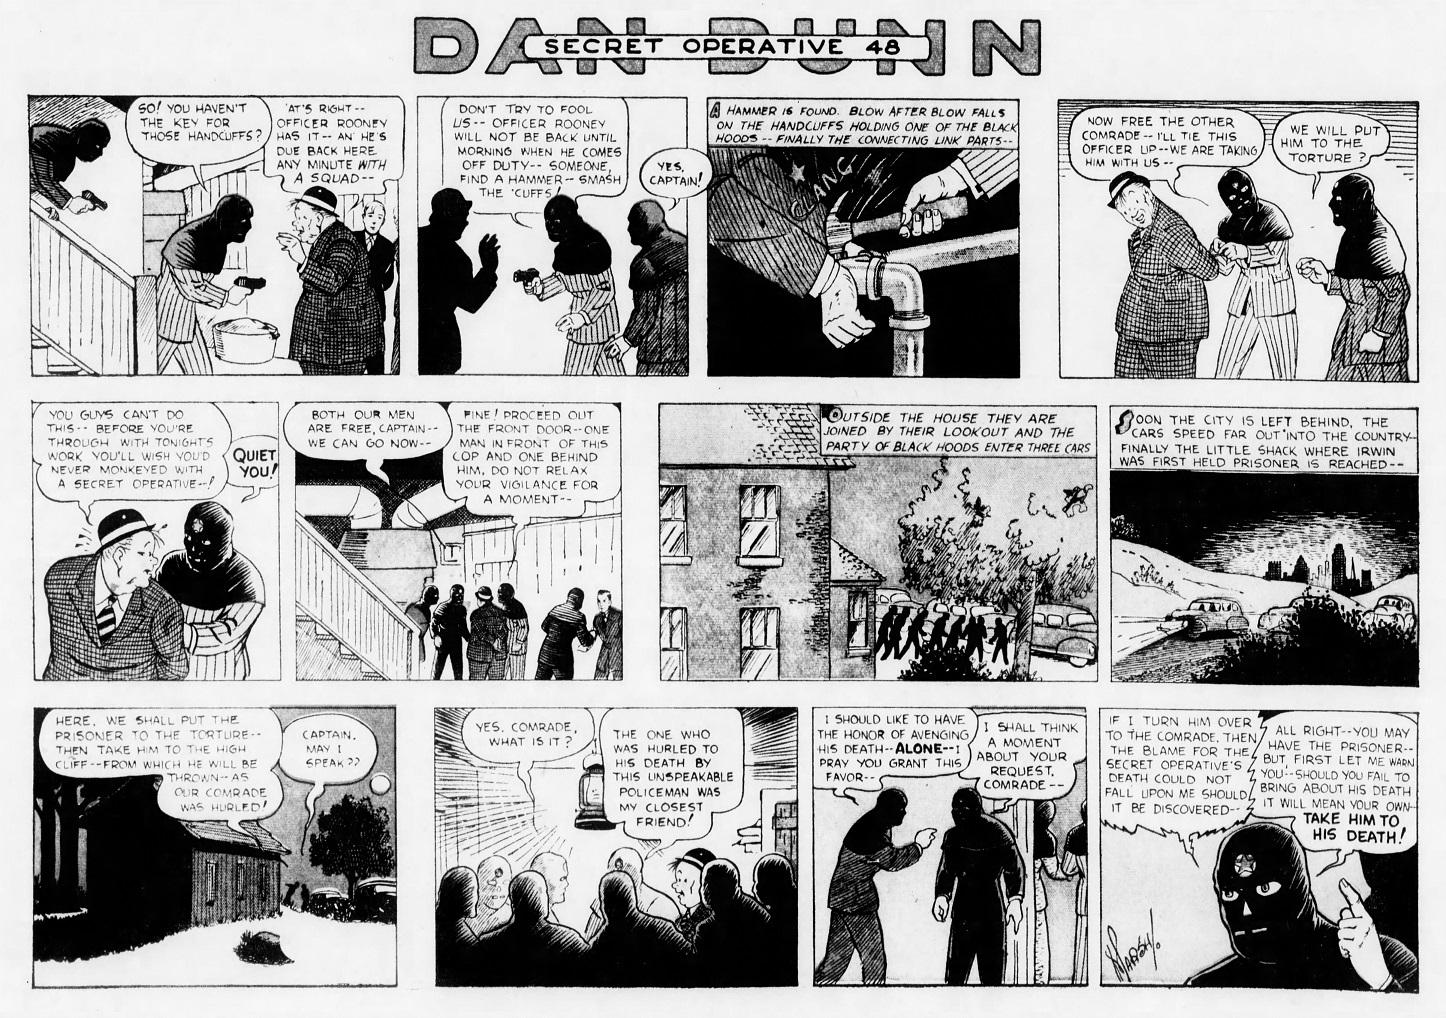 The_Brooklyn_Daily_Eagle_Sun__Apr_14__1940_(8).jpg